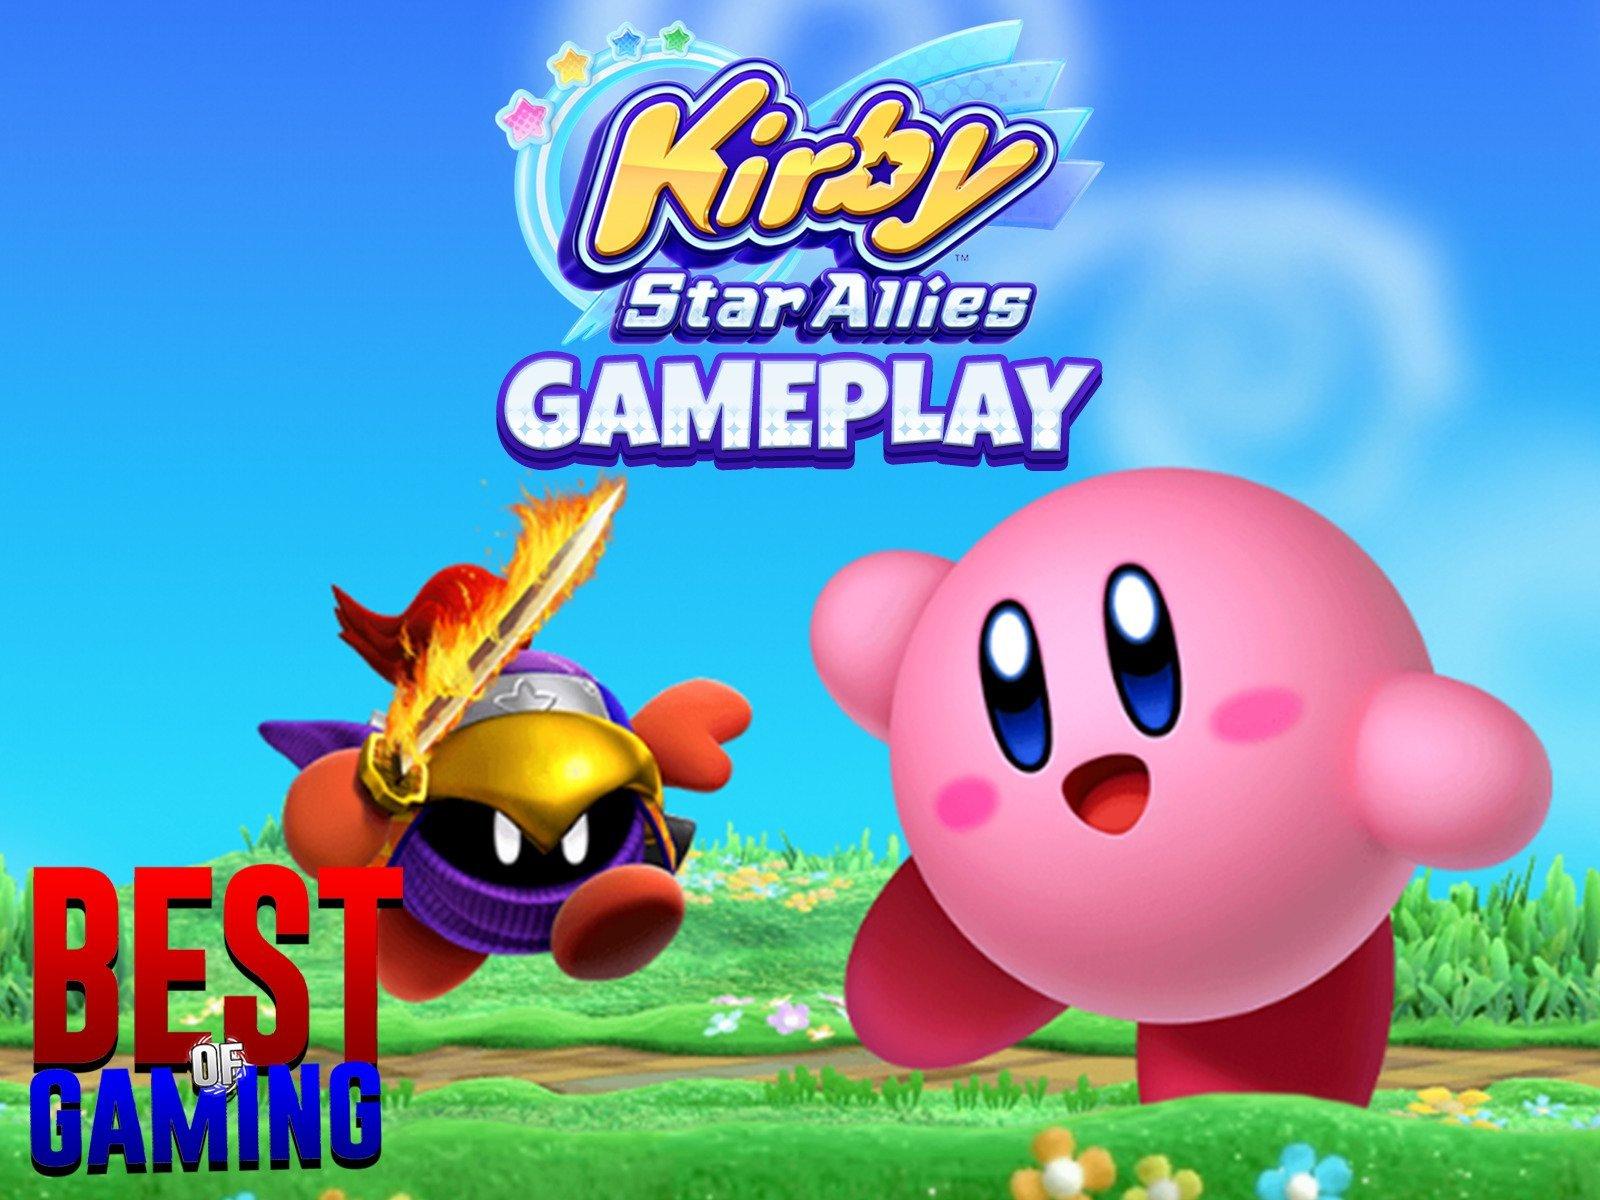 Clip: Kirby Star Allies Gameplay - Best of Gaming! - Season 1